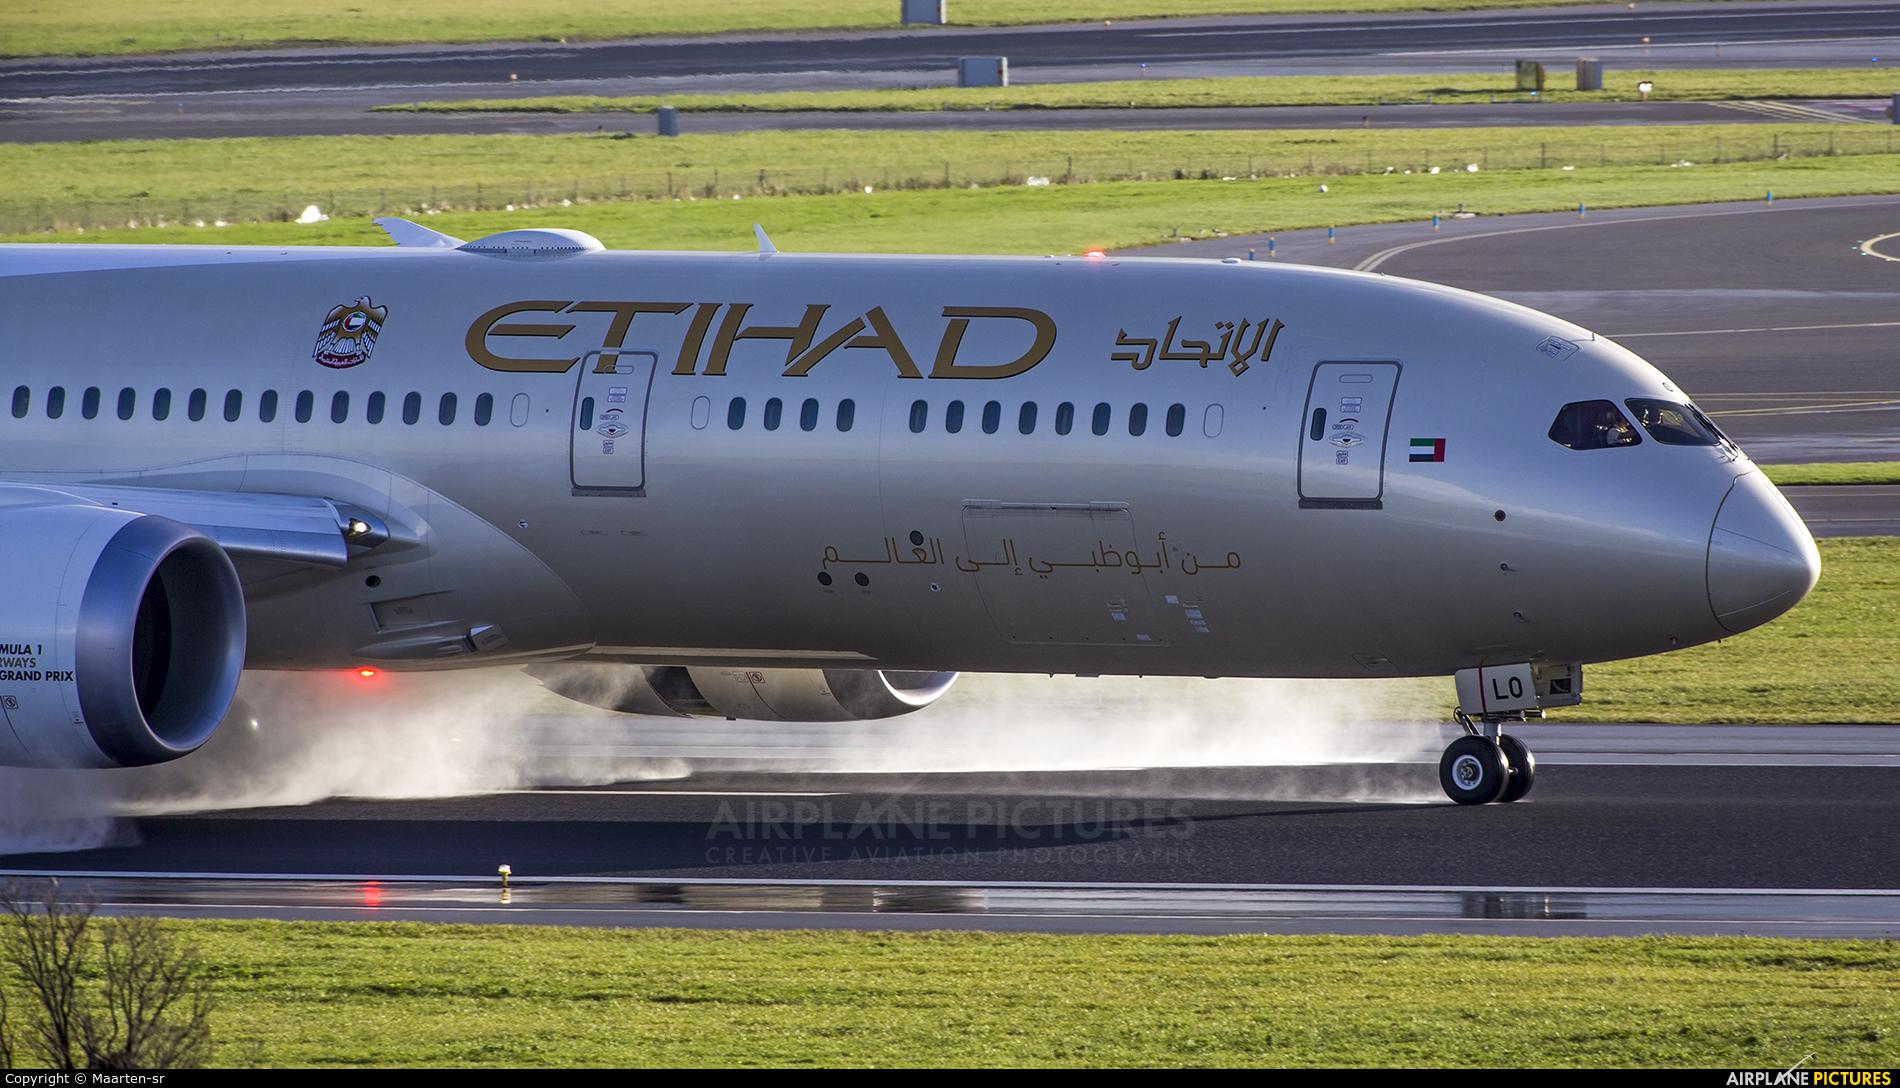 Etihad Airways A6-BLO aircraft at Amsterdam - Schiphol